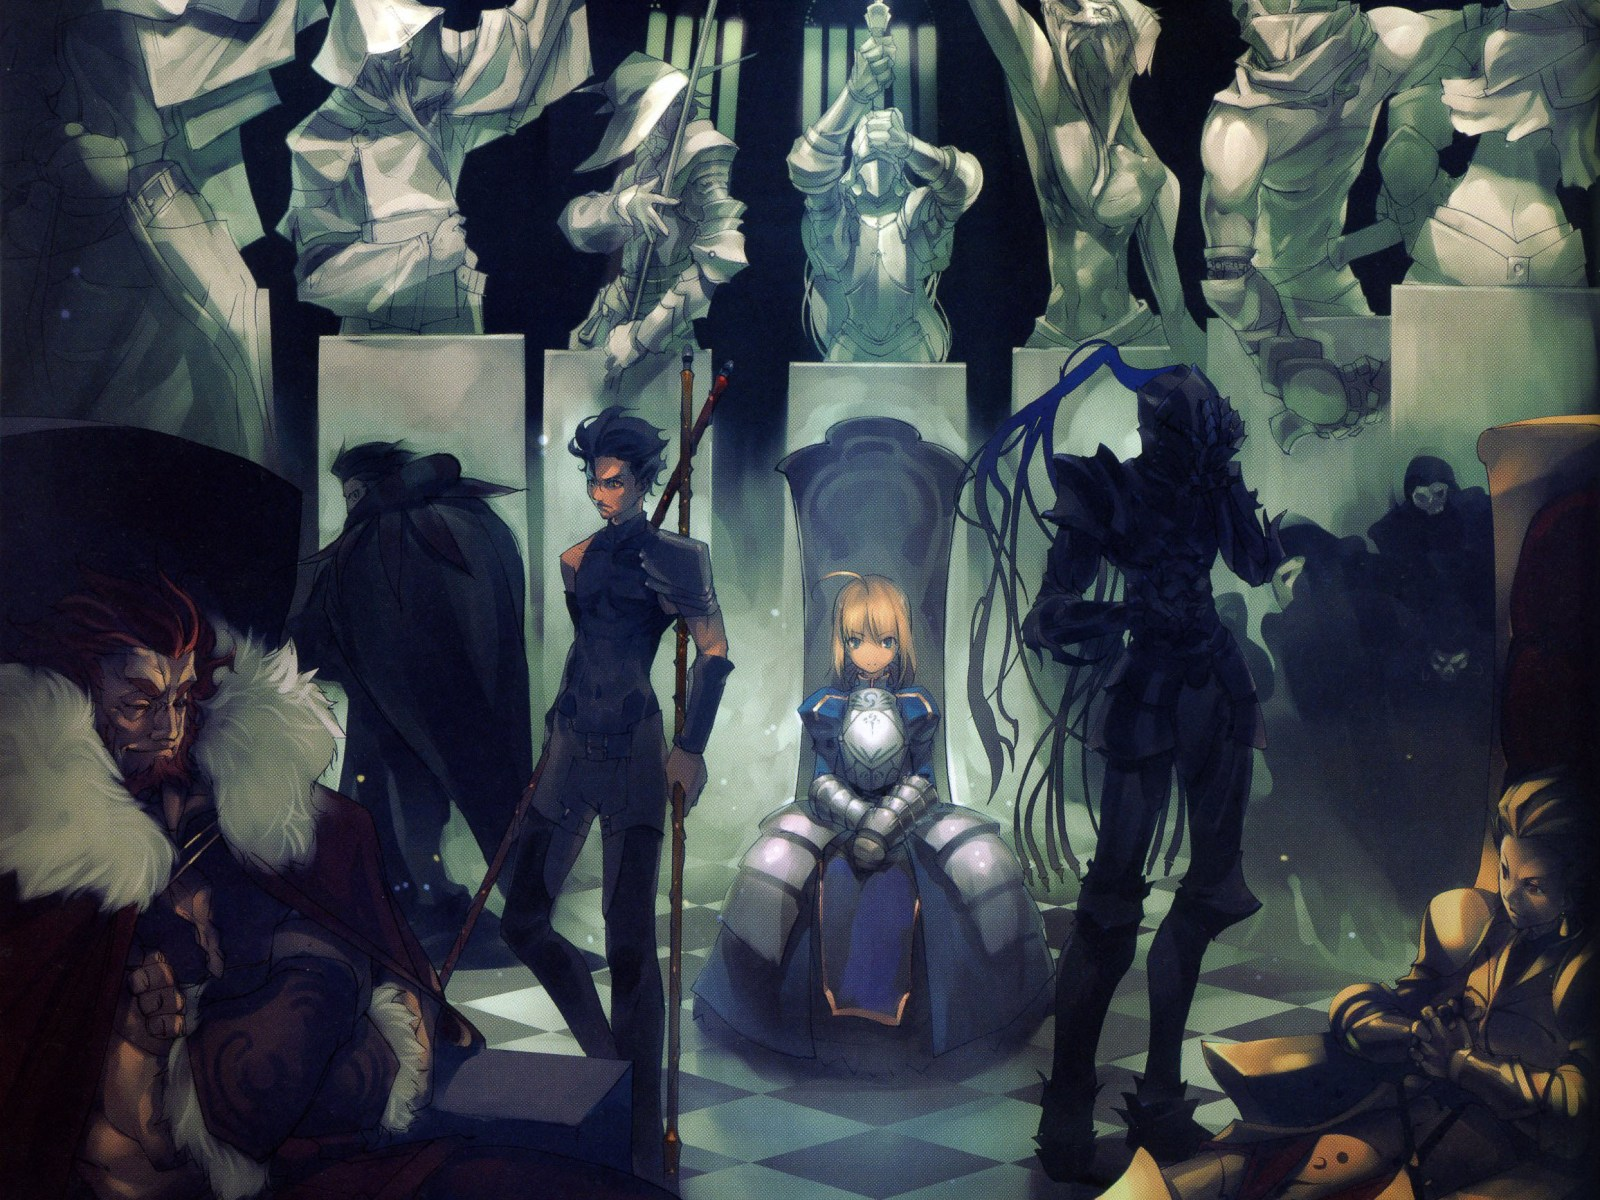 Fate Stay Night Lancer Wallpaper 20 Anime Wallpaper Animewp Com